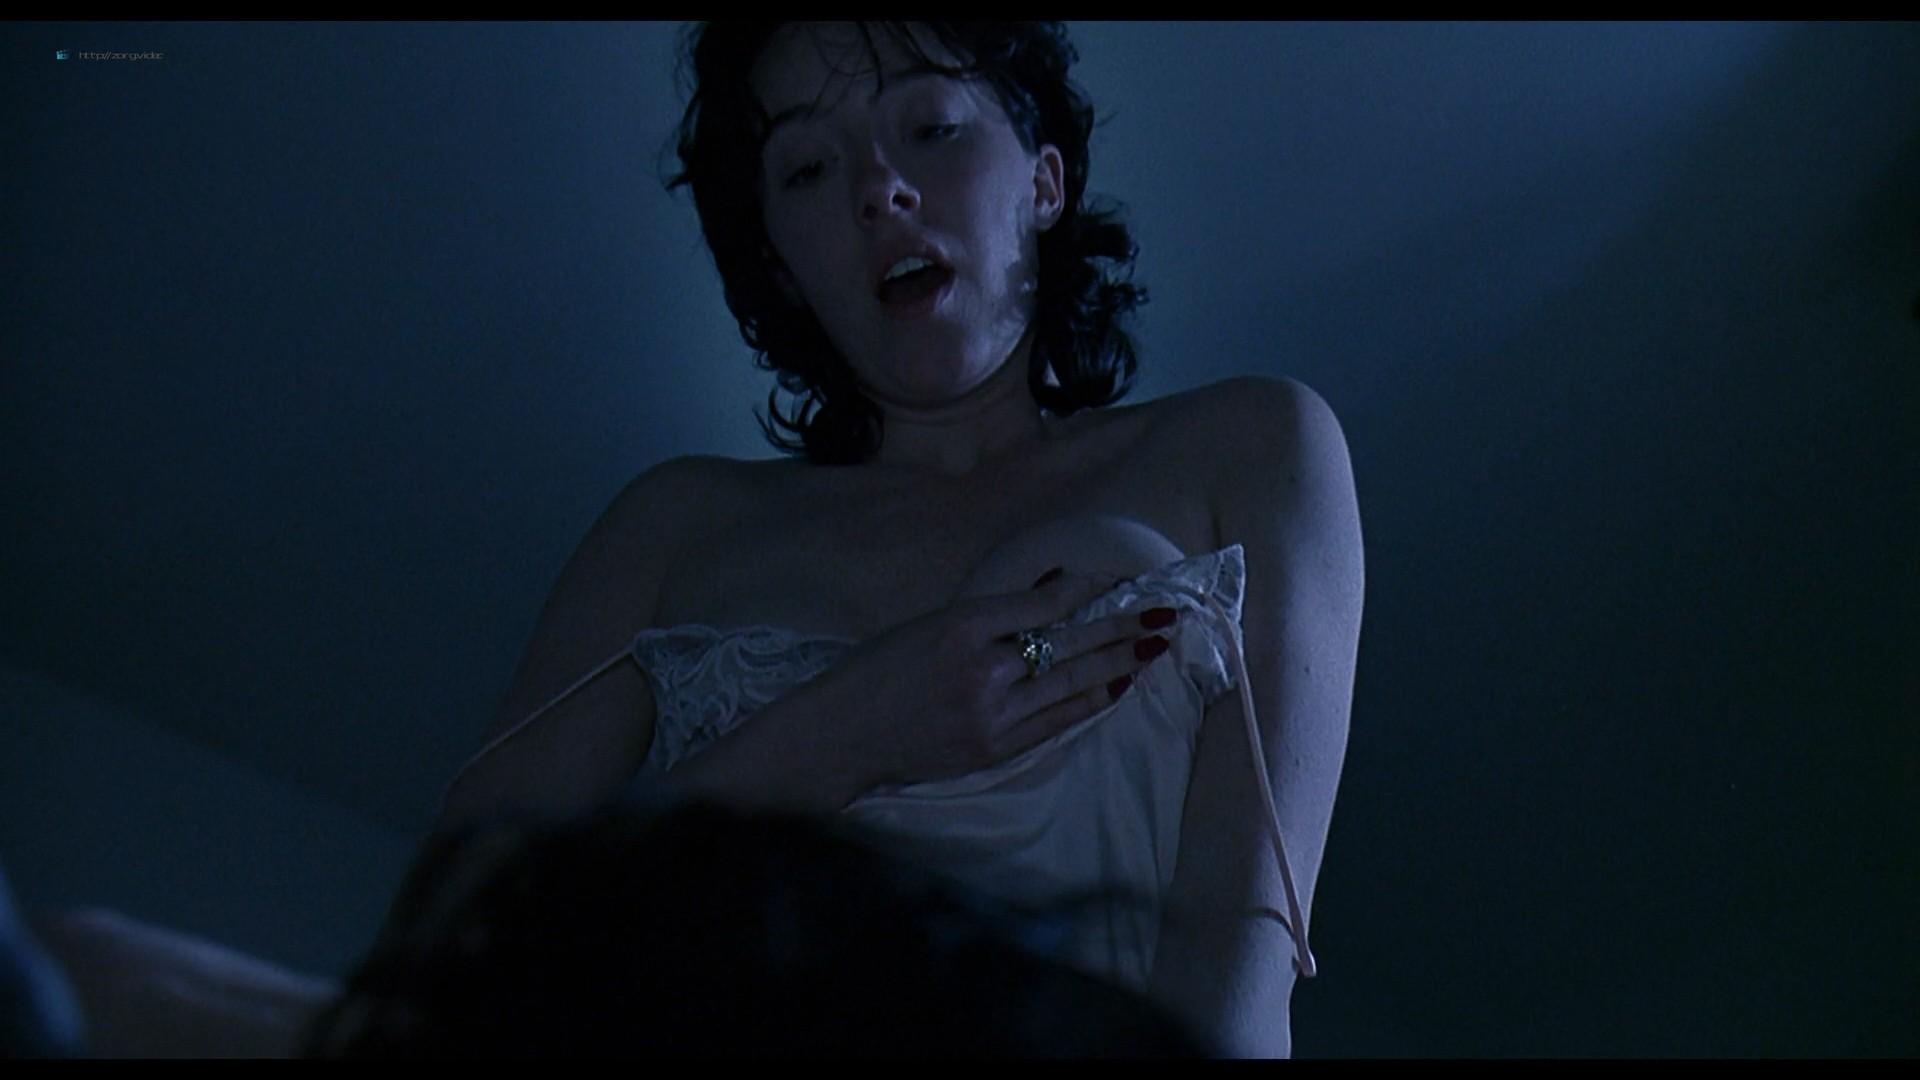 Jennifer Connelly nude side boob sex in – Waking the Dead (2000) HD 1080p BluRay (10)